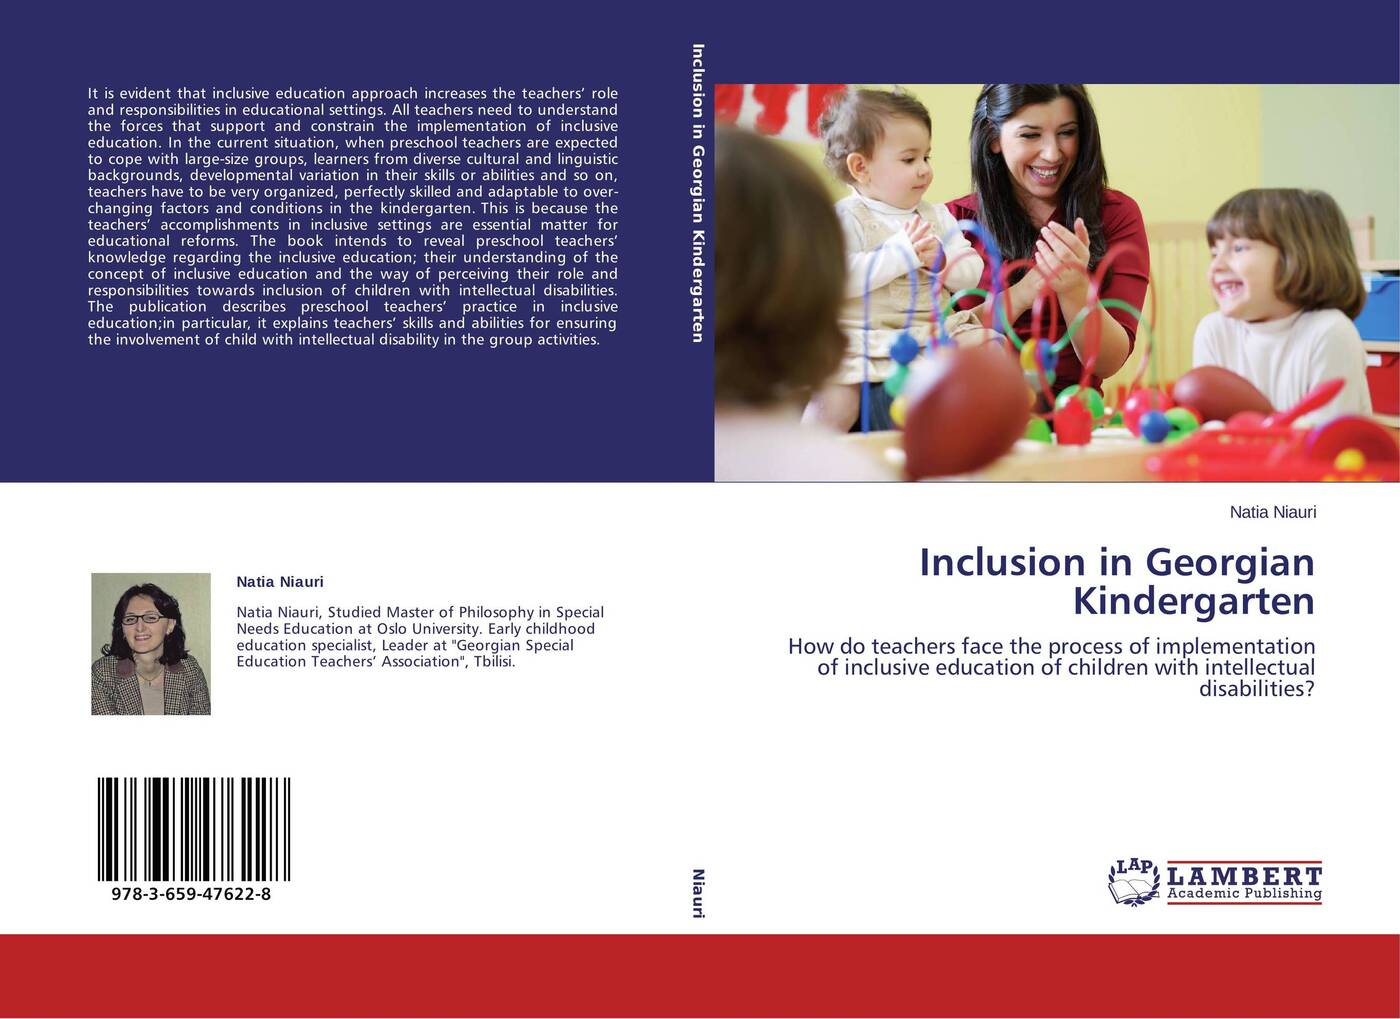 Natia Niauri Inclusion in Georgian Kindergarten karanja david gakunga daniel komo teachers efficacy in the implementation of inclusive education